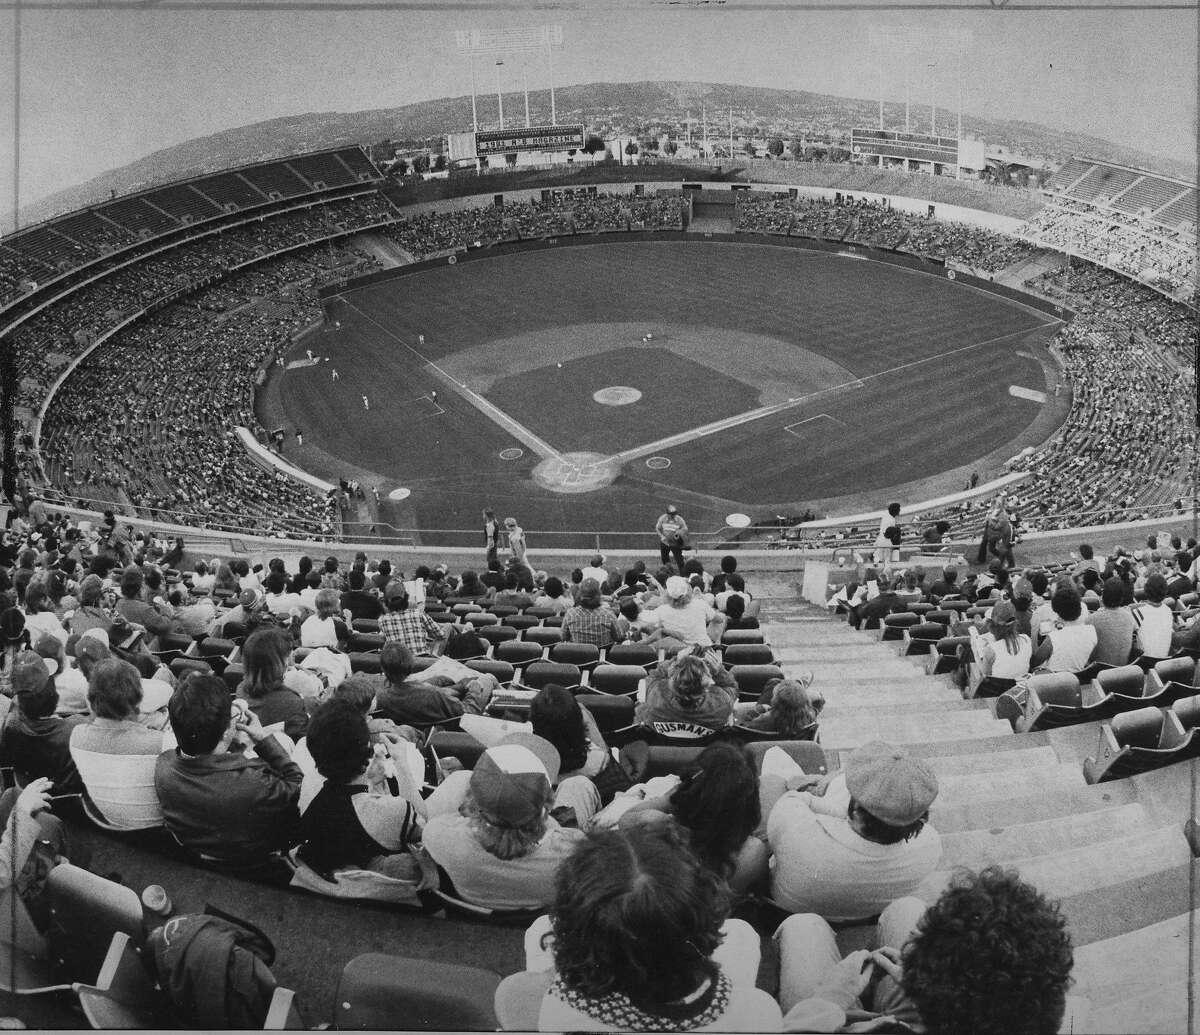 Oakland Athletics game April 1981 at the Oakland Coliseum Photo ran 05/11/1981